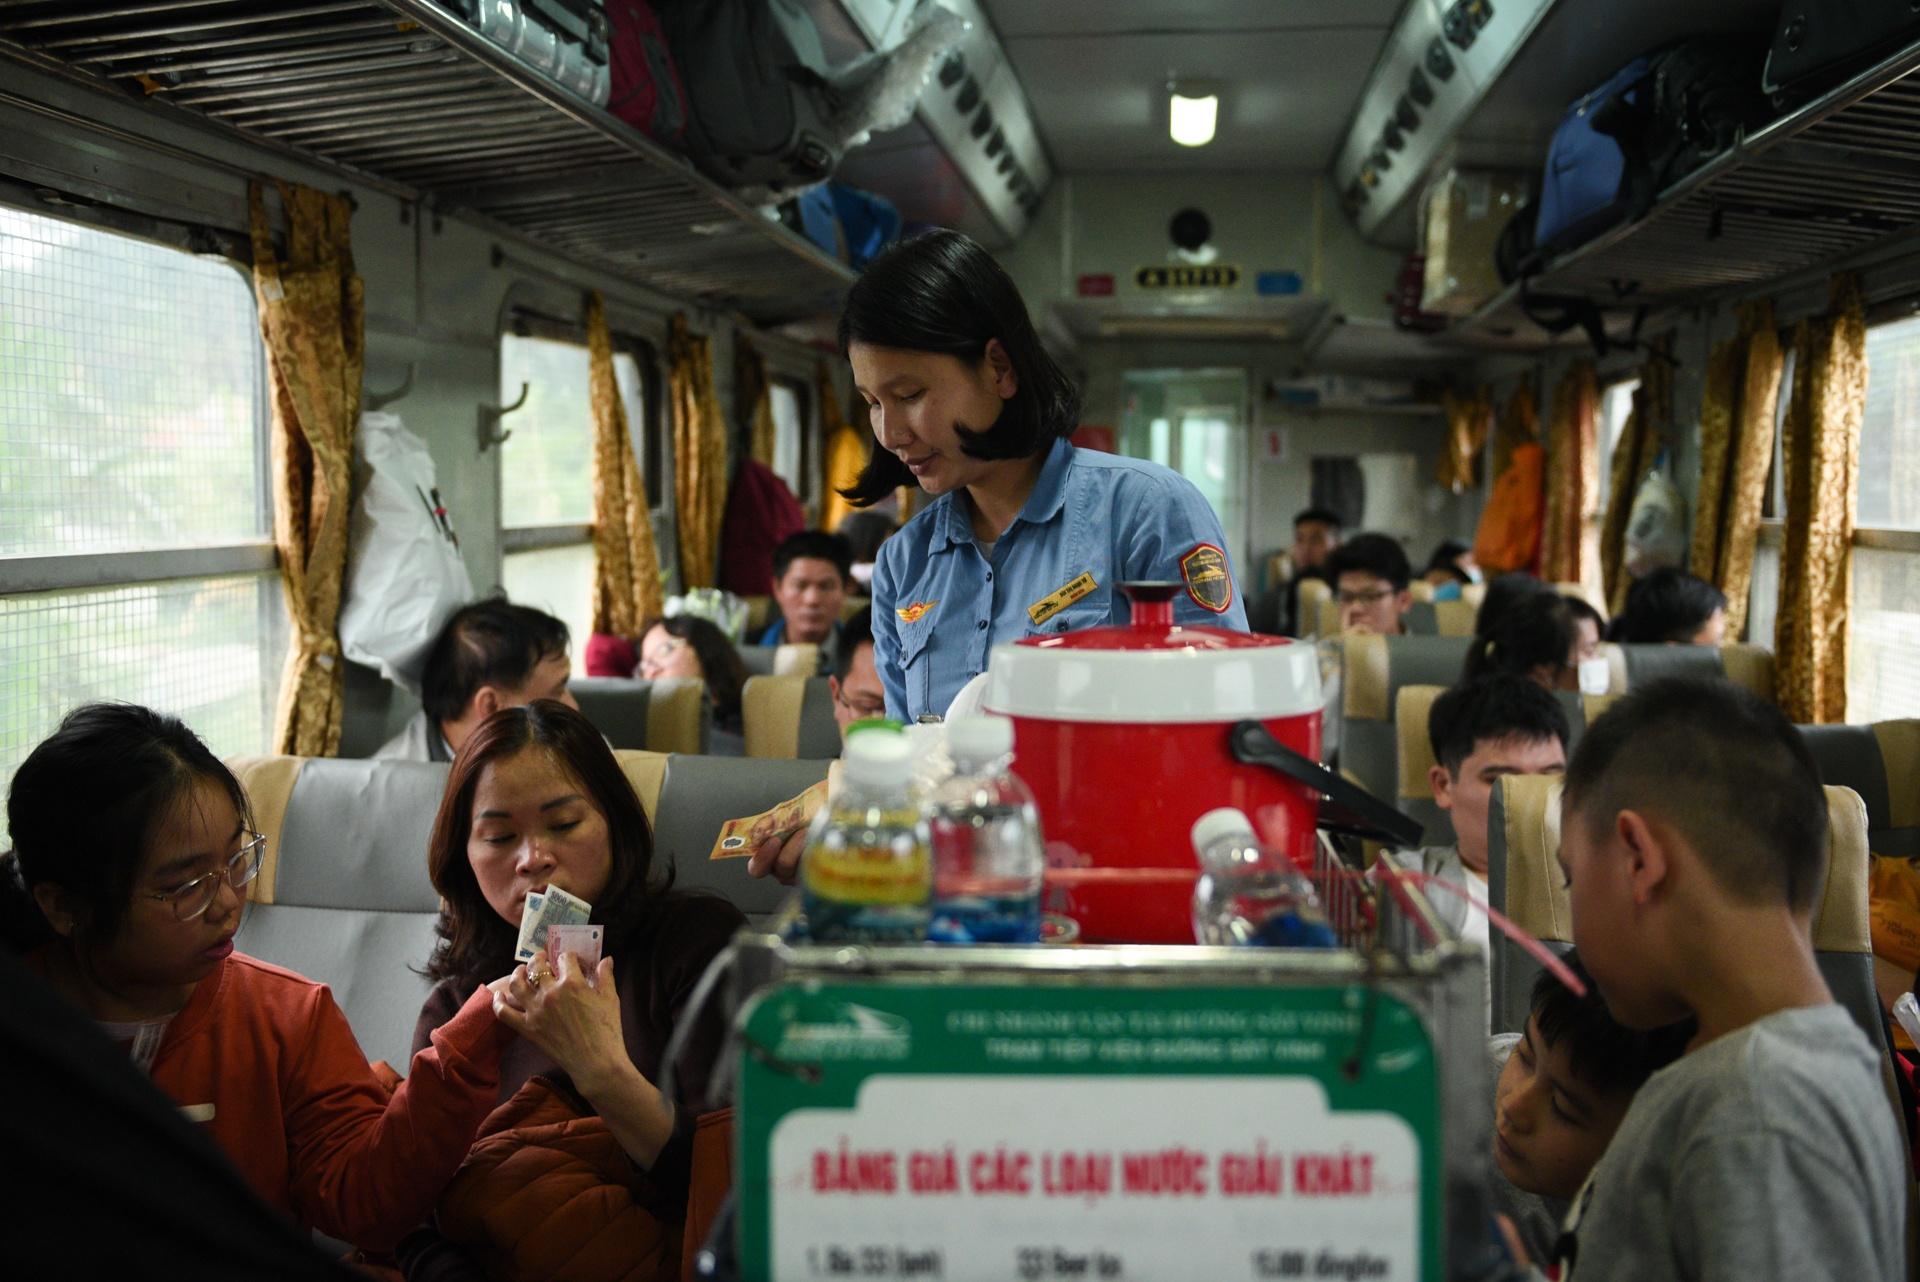 Tet tren nhung chuyen tau cuoi cung cua nam Ky Hoi hinh anh 24 DSC_2768_zing.jpg